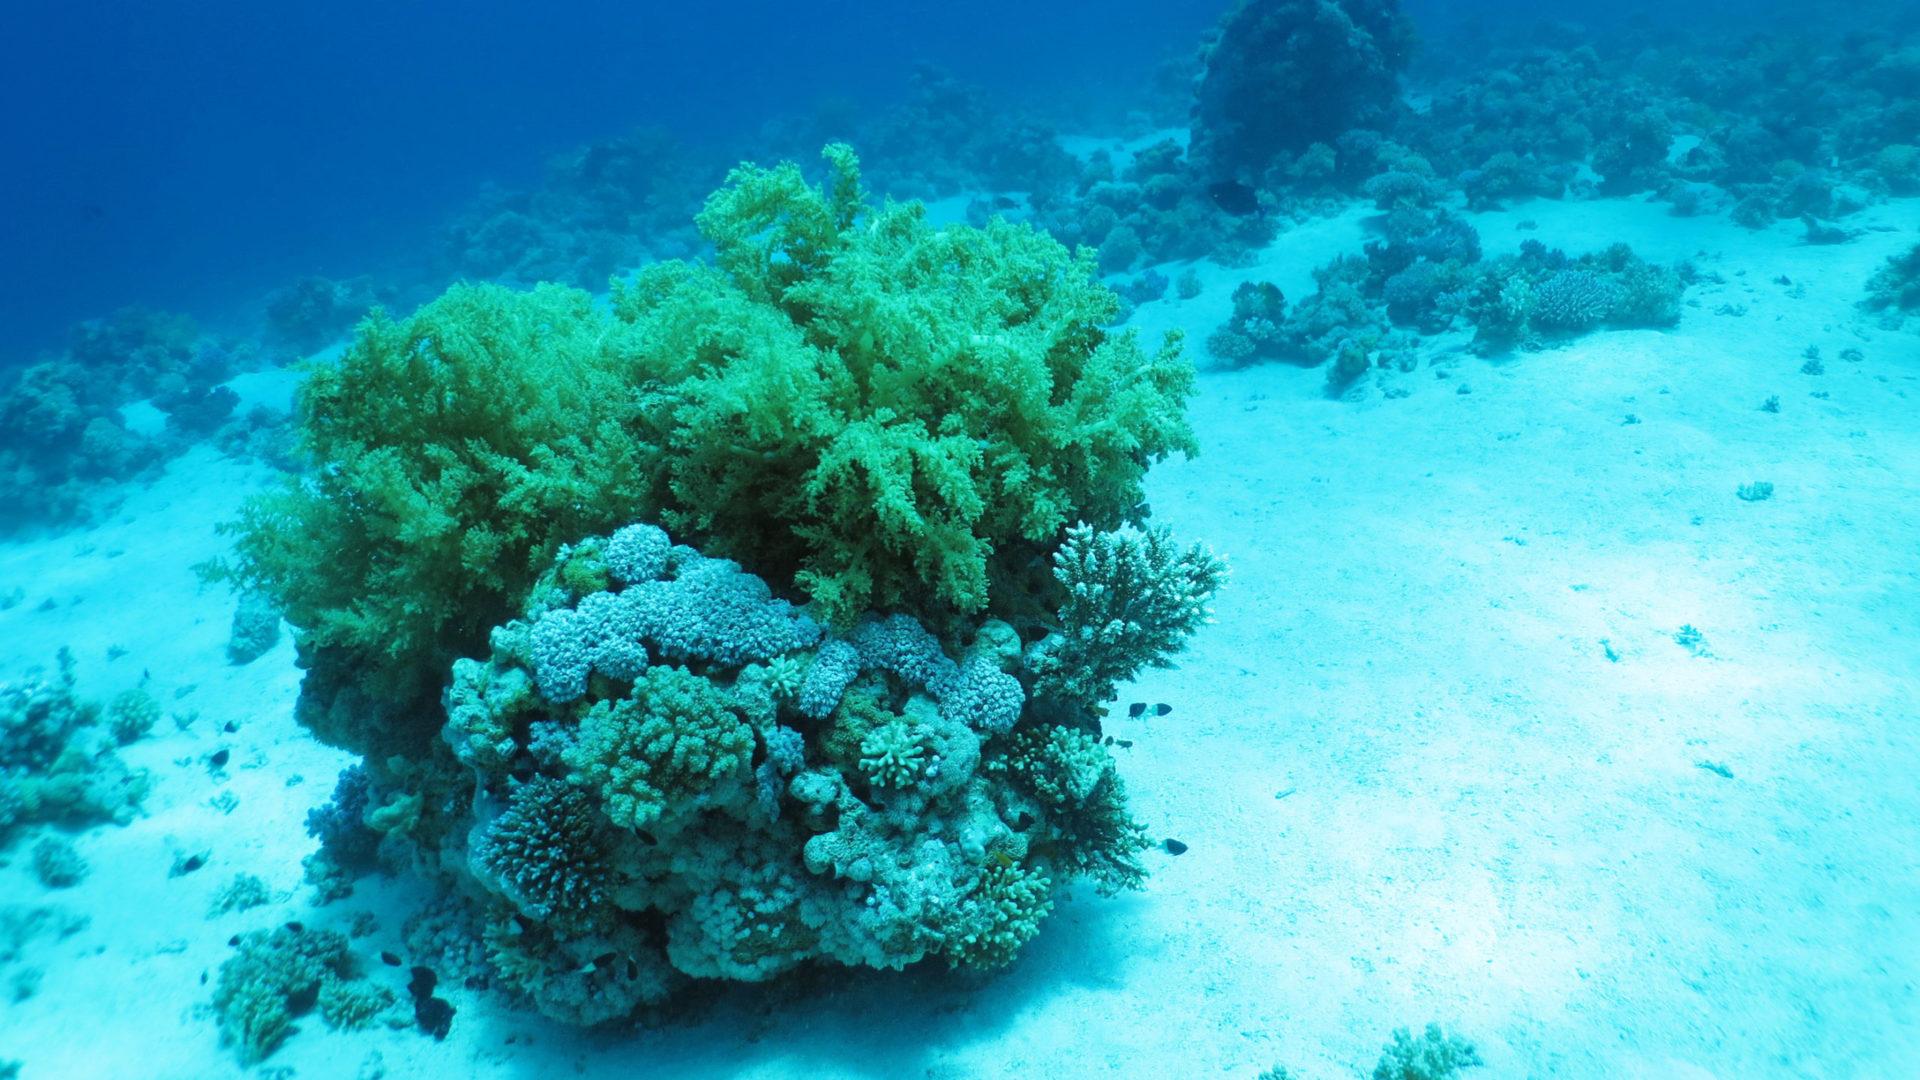 skała w akwarium morskim